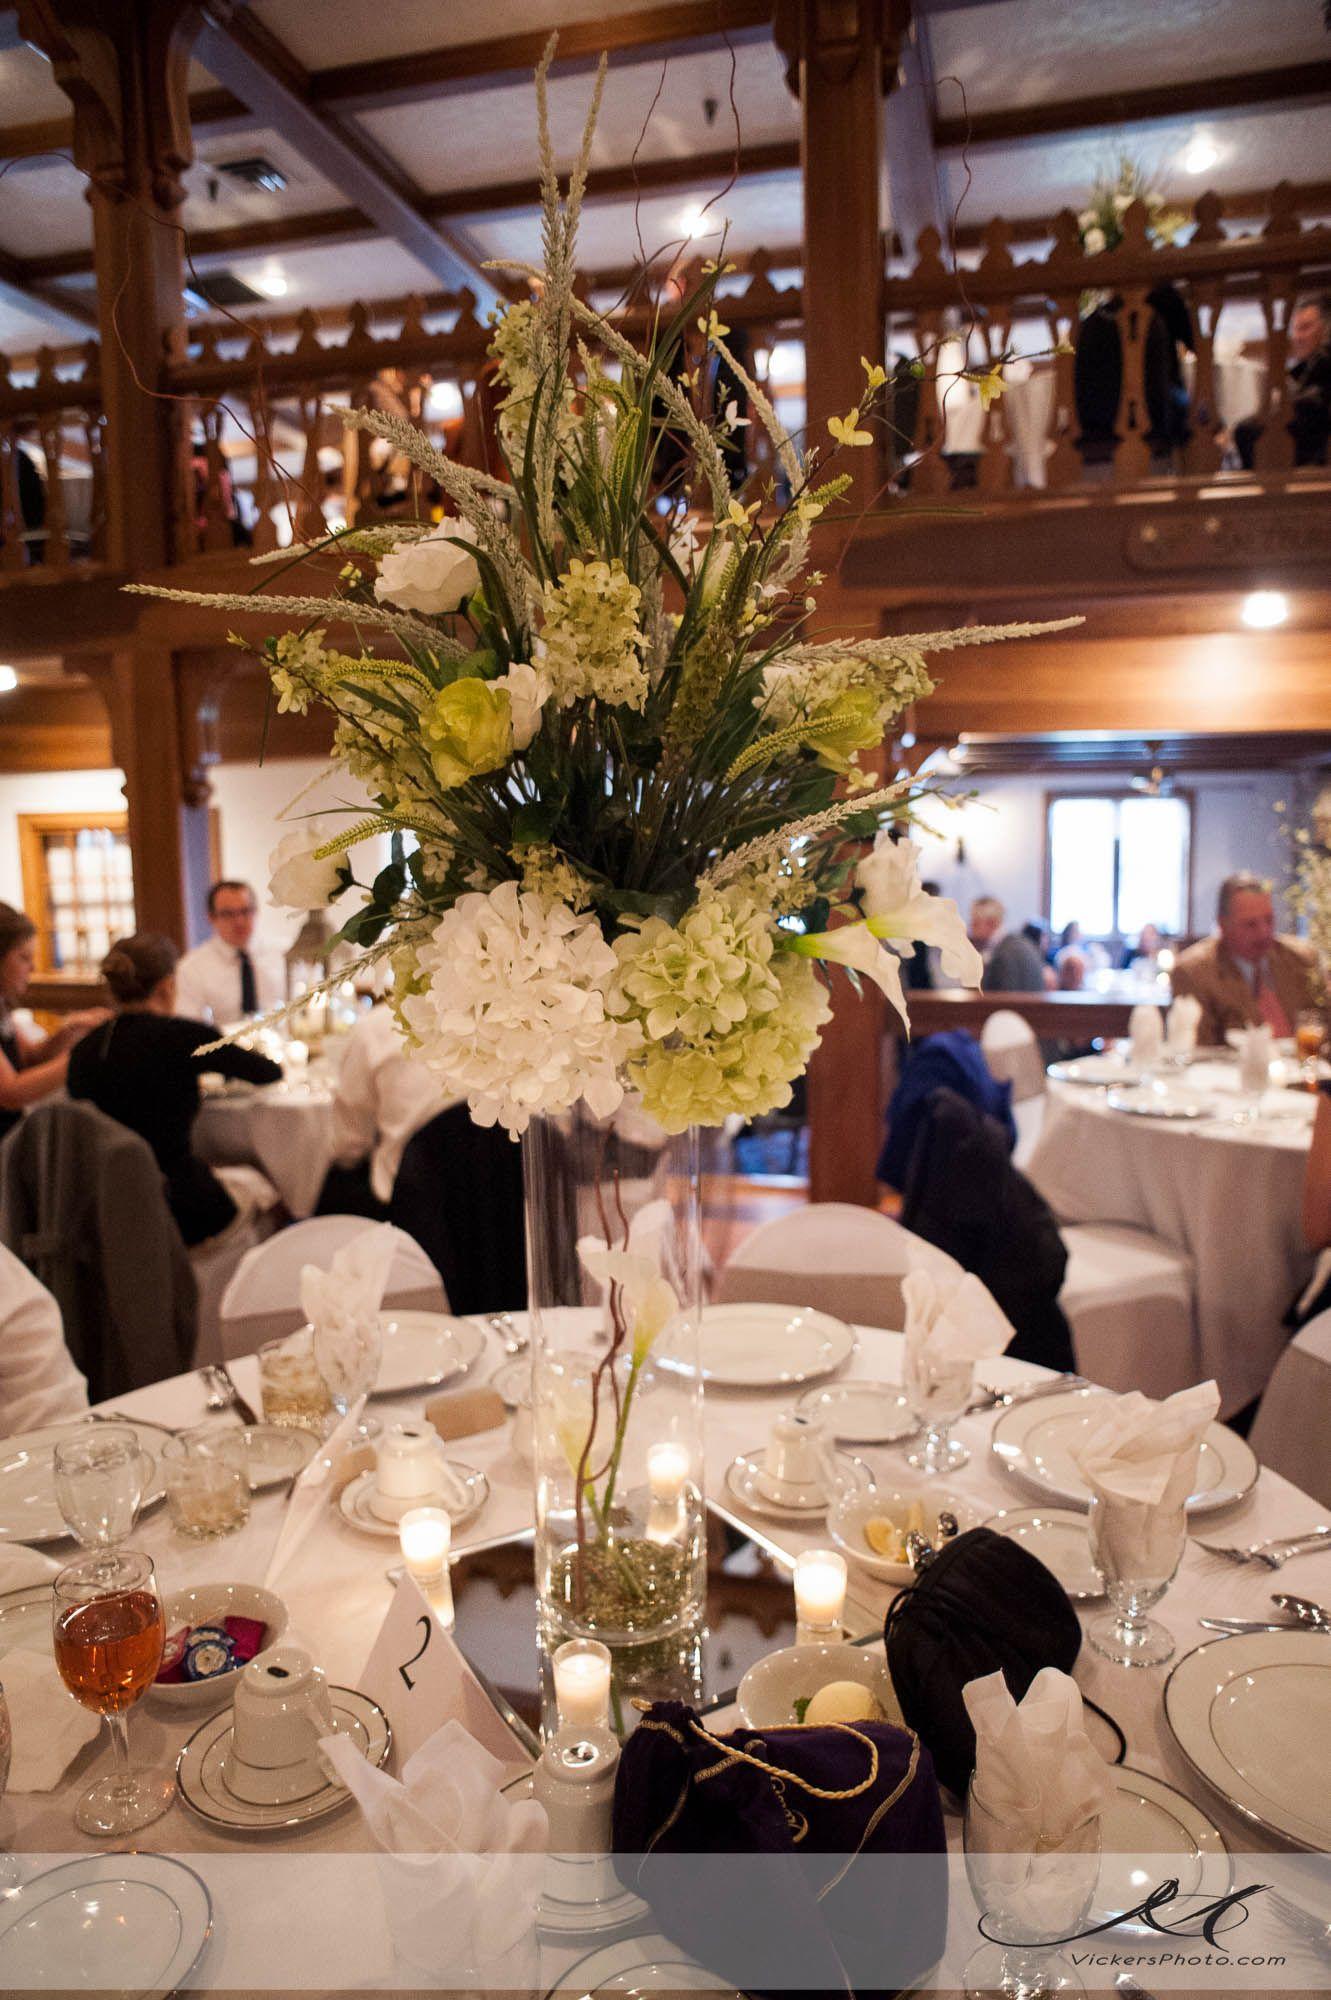 Bauerhaus Evansville Indiana Reception venues, Table